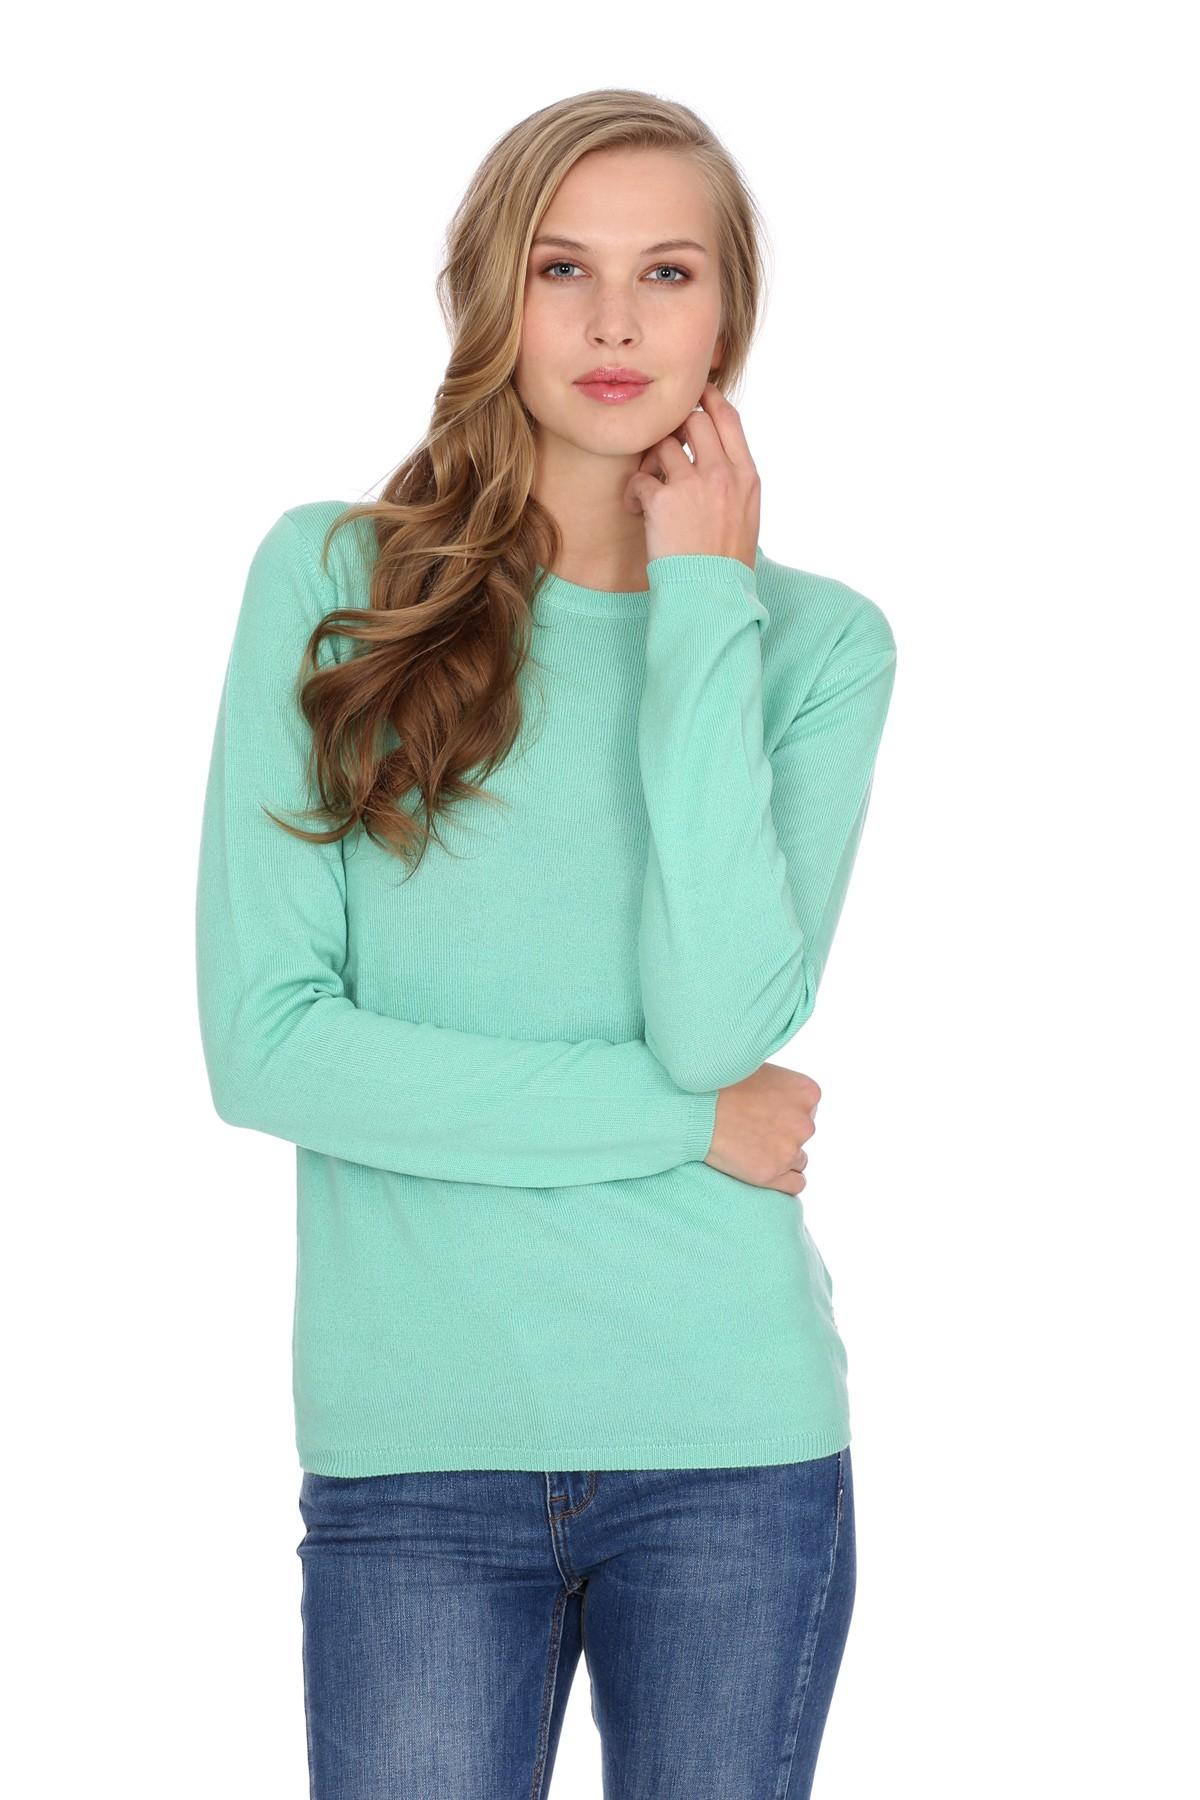 Women's round-neck cashmere sweater mint